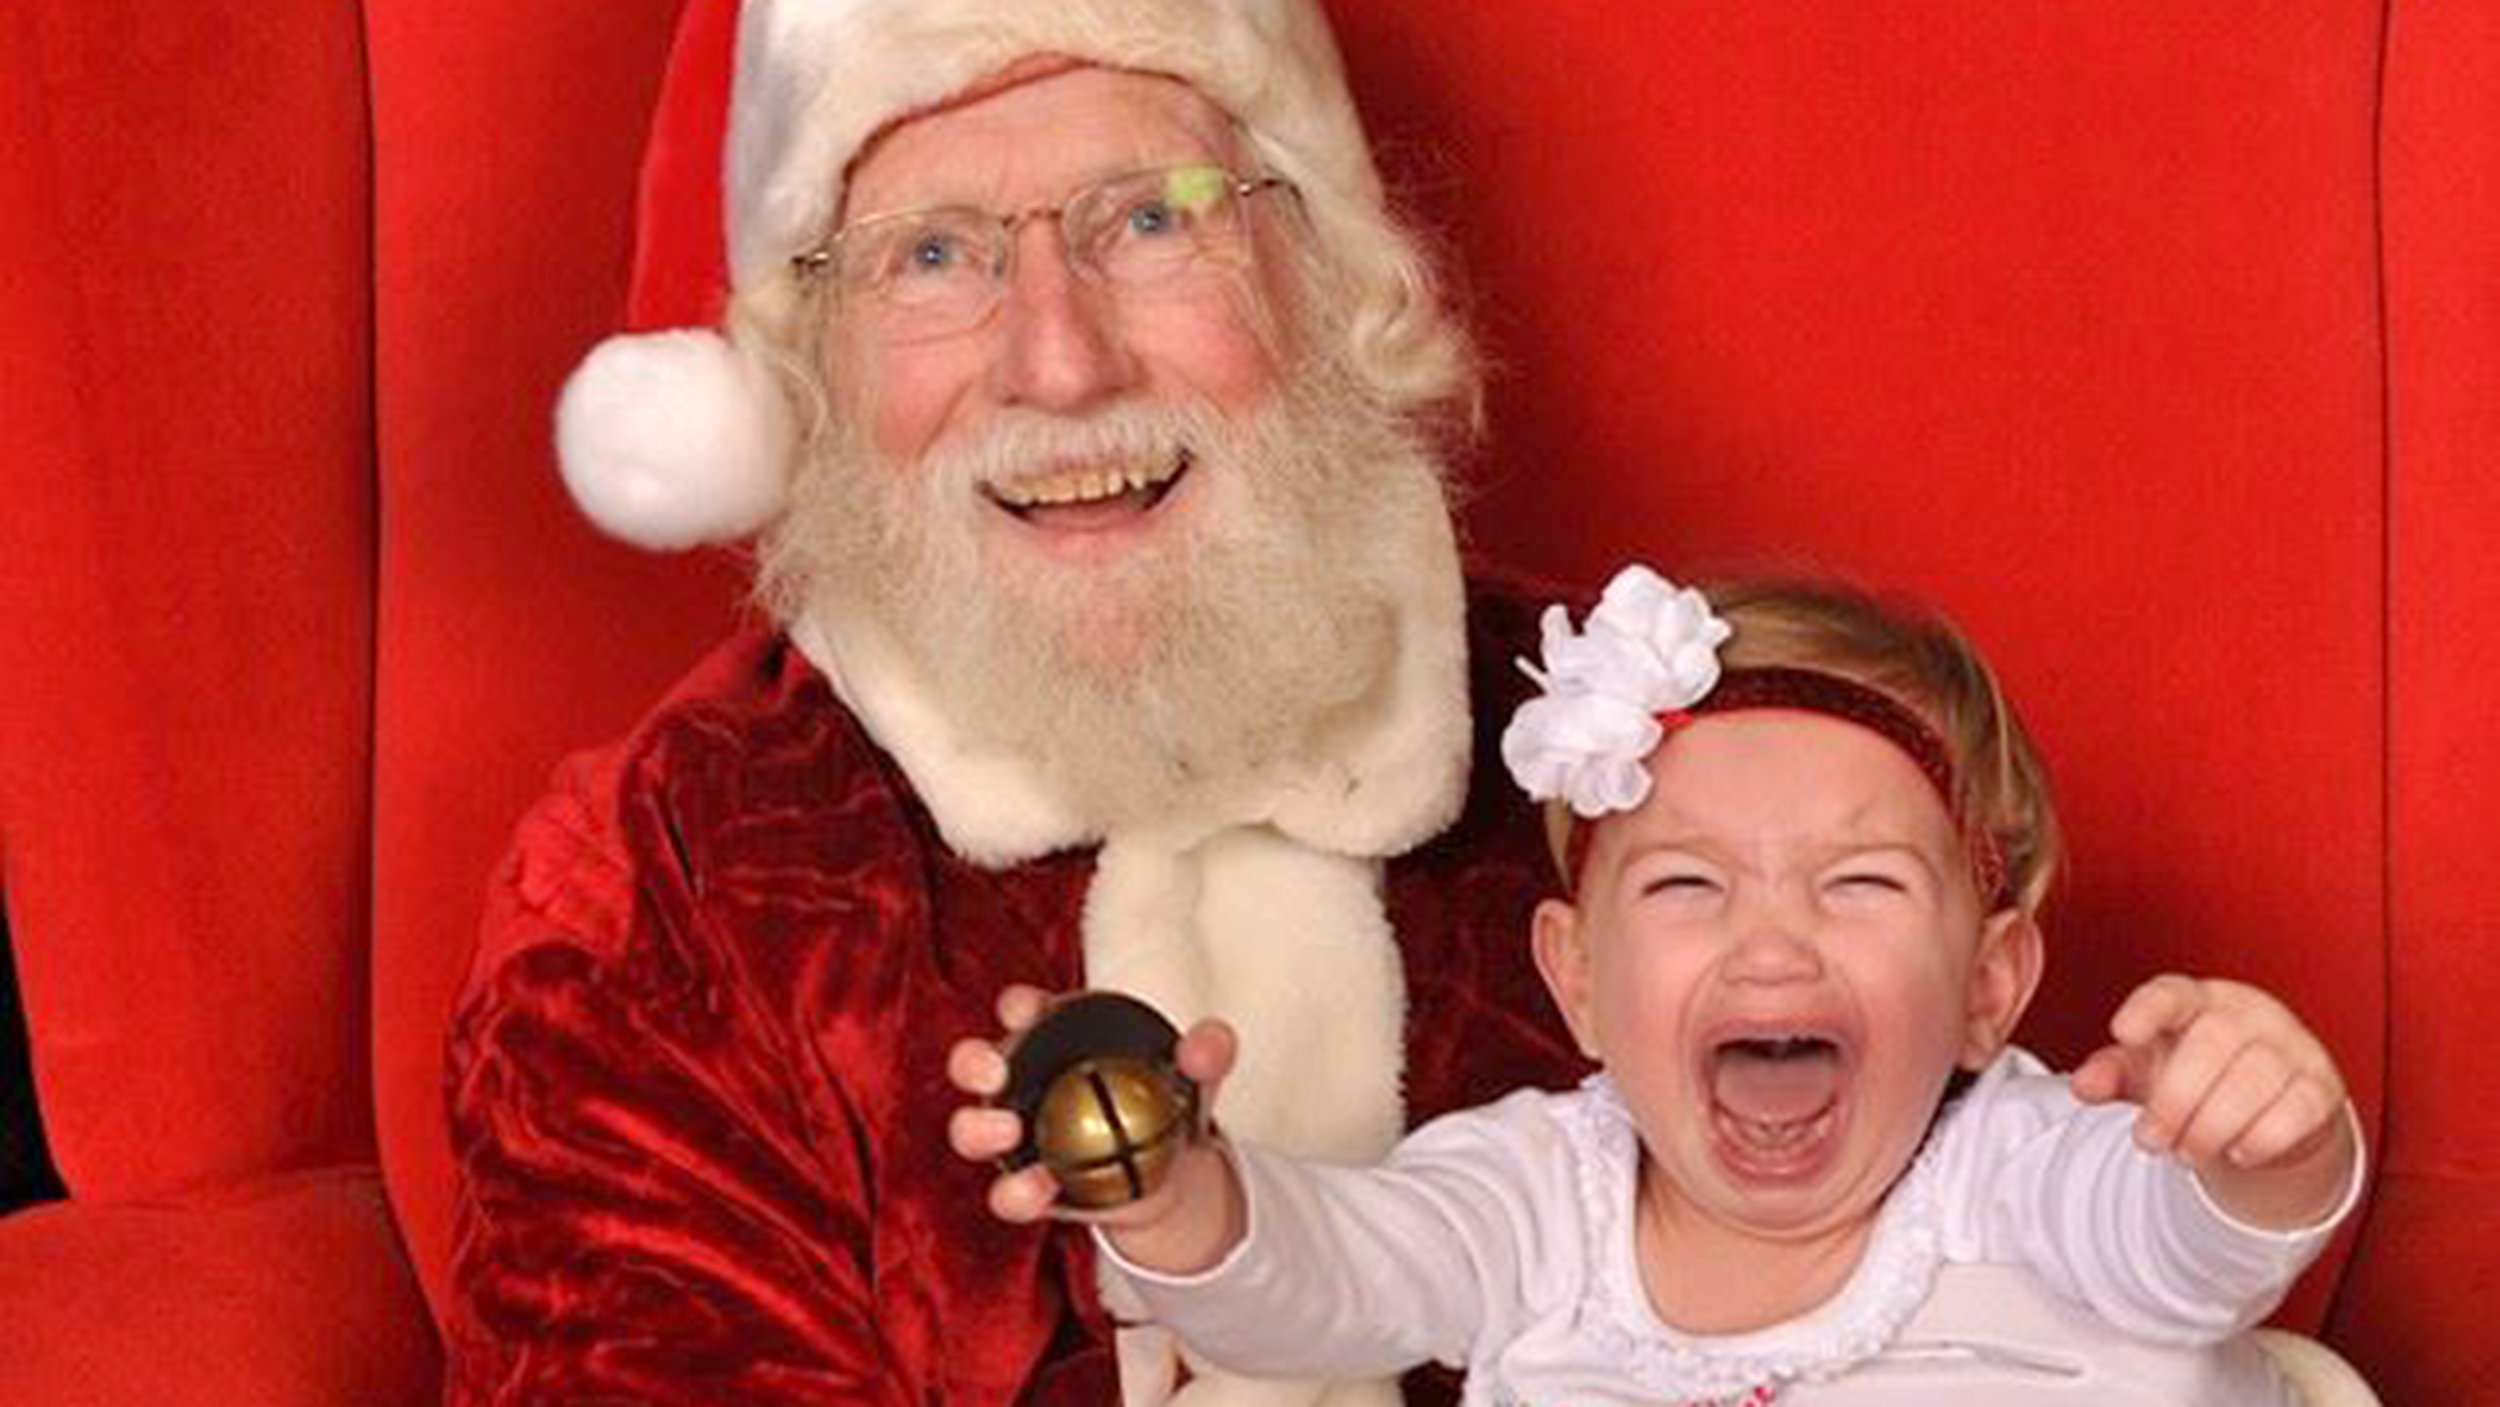 kids scared of santa 15 photos of hilarious ho ho horror today com